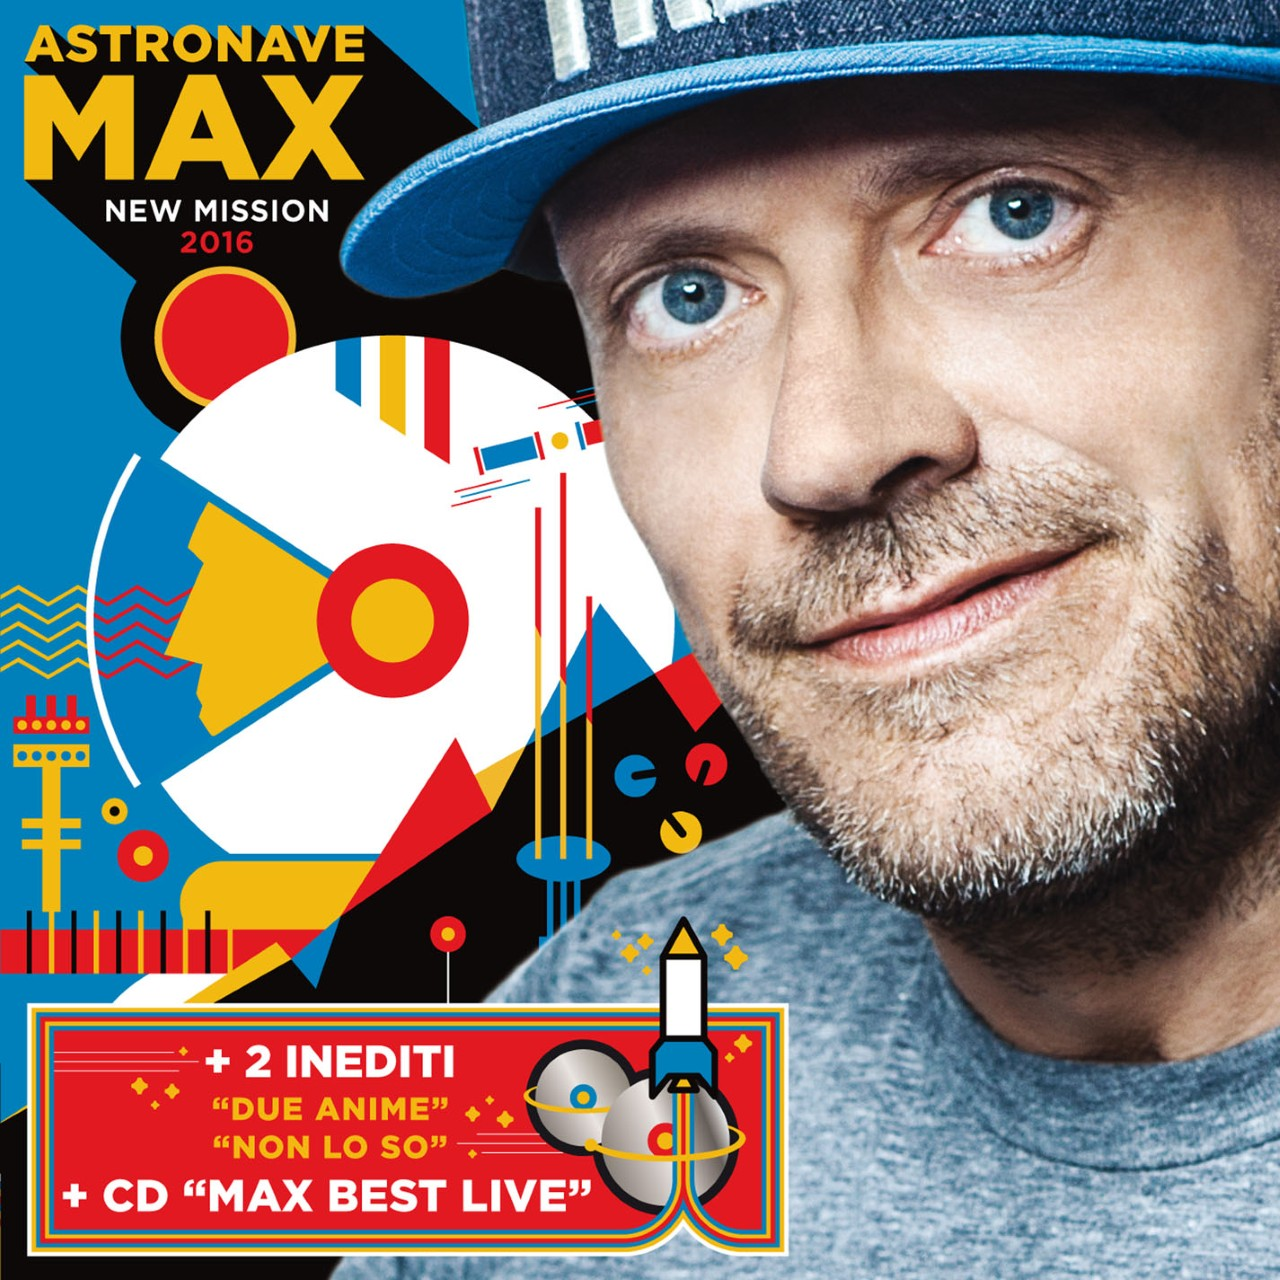 thumbnail_Cover Pezzali_Astronave Max_2016_OK